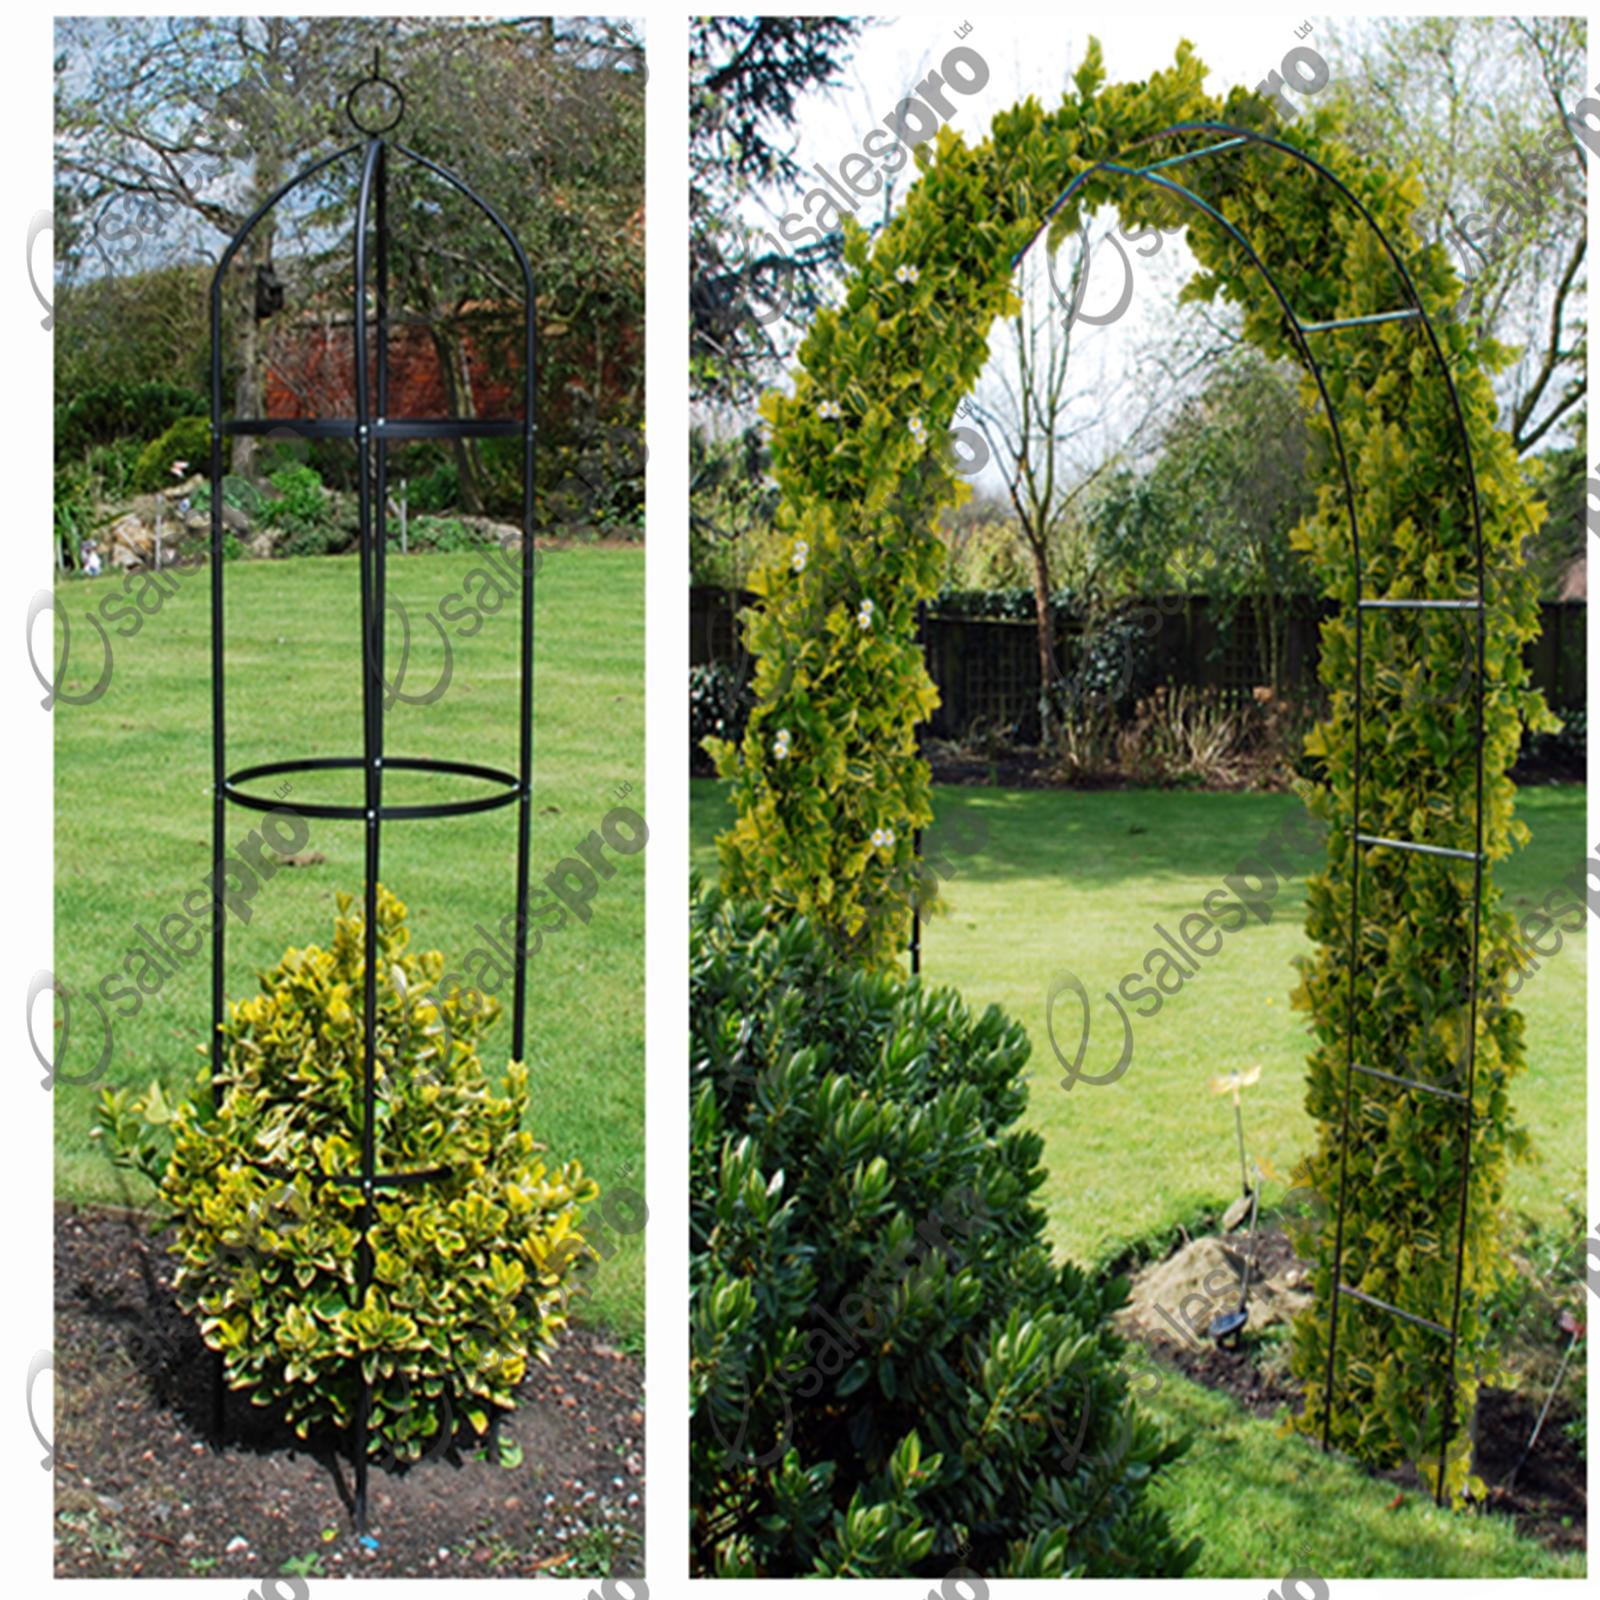 Garden Arch & Obelisk Trellis Feature Climbing Plant Roses